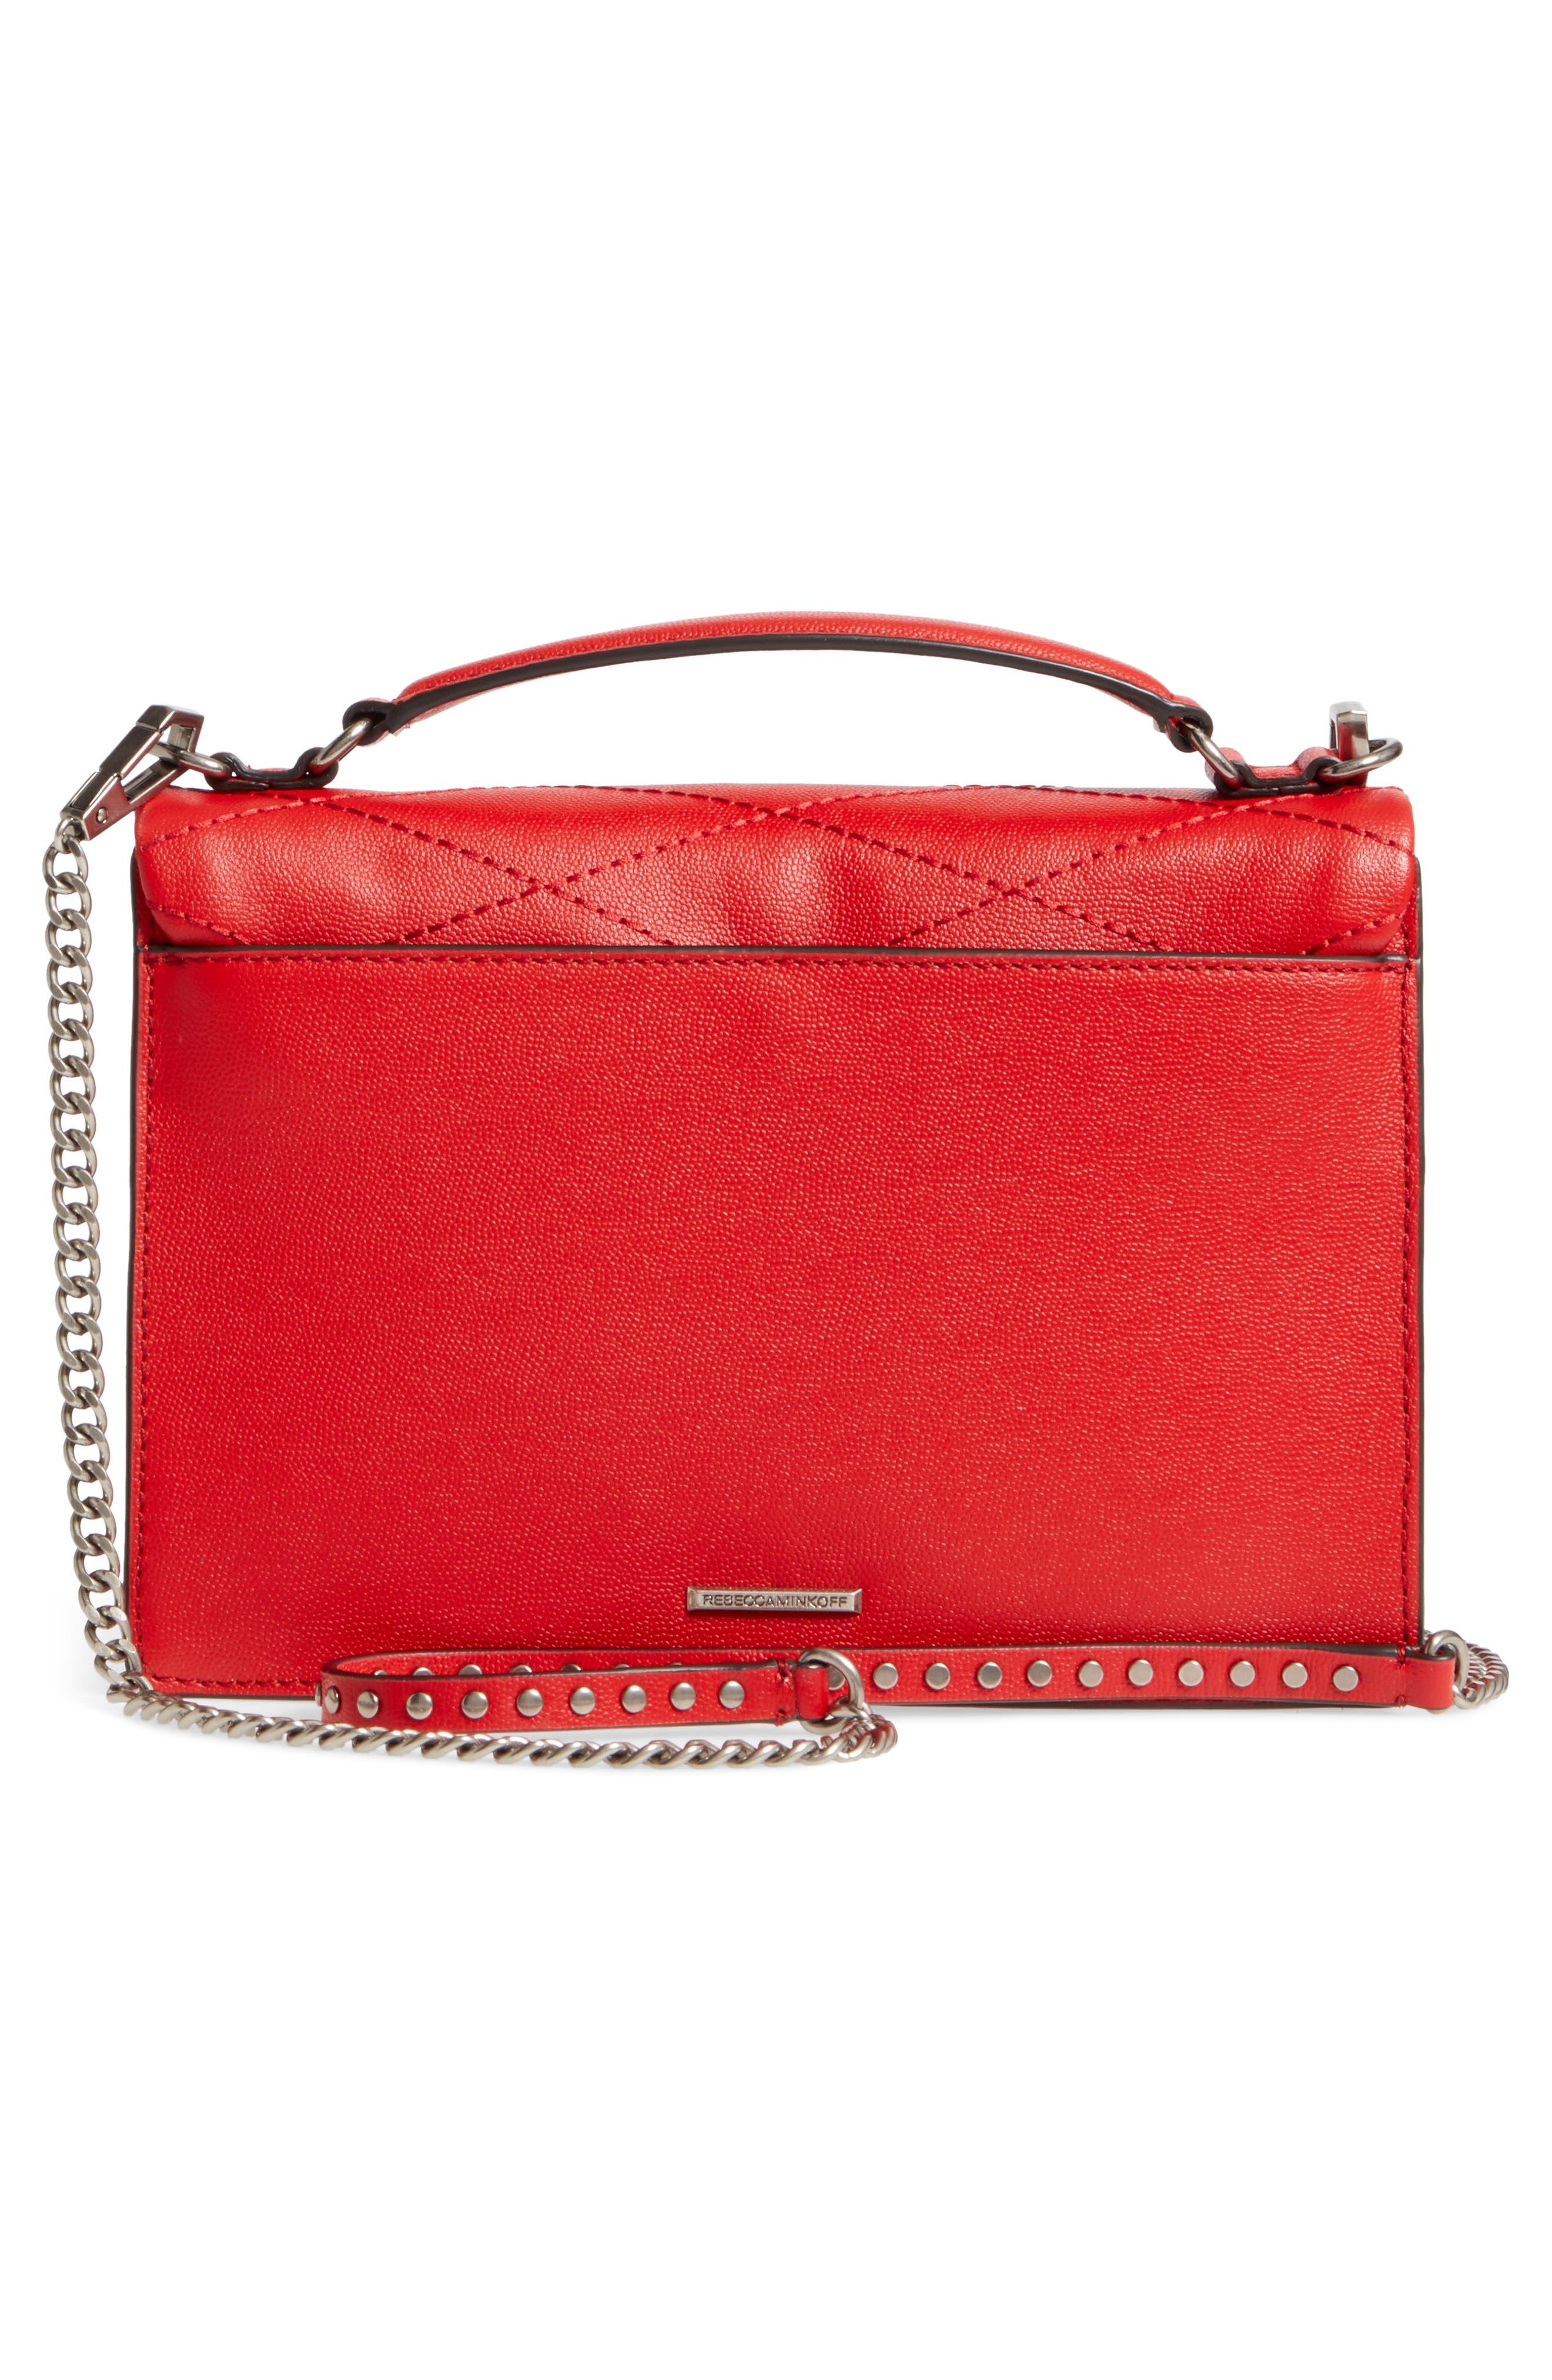 Medium Je T'aime Convertible Leather Crossbody Bag,                             Alternate thumbnail 27, color,